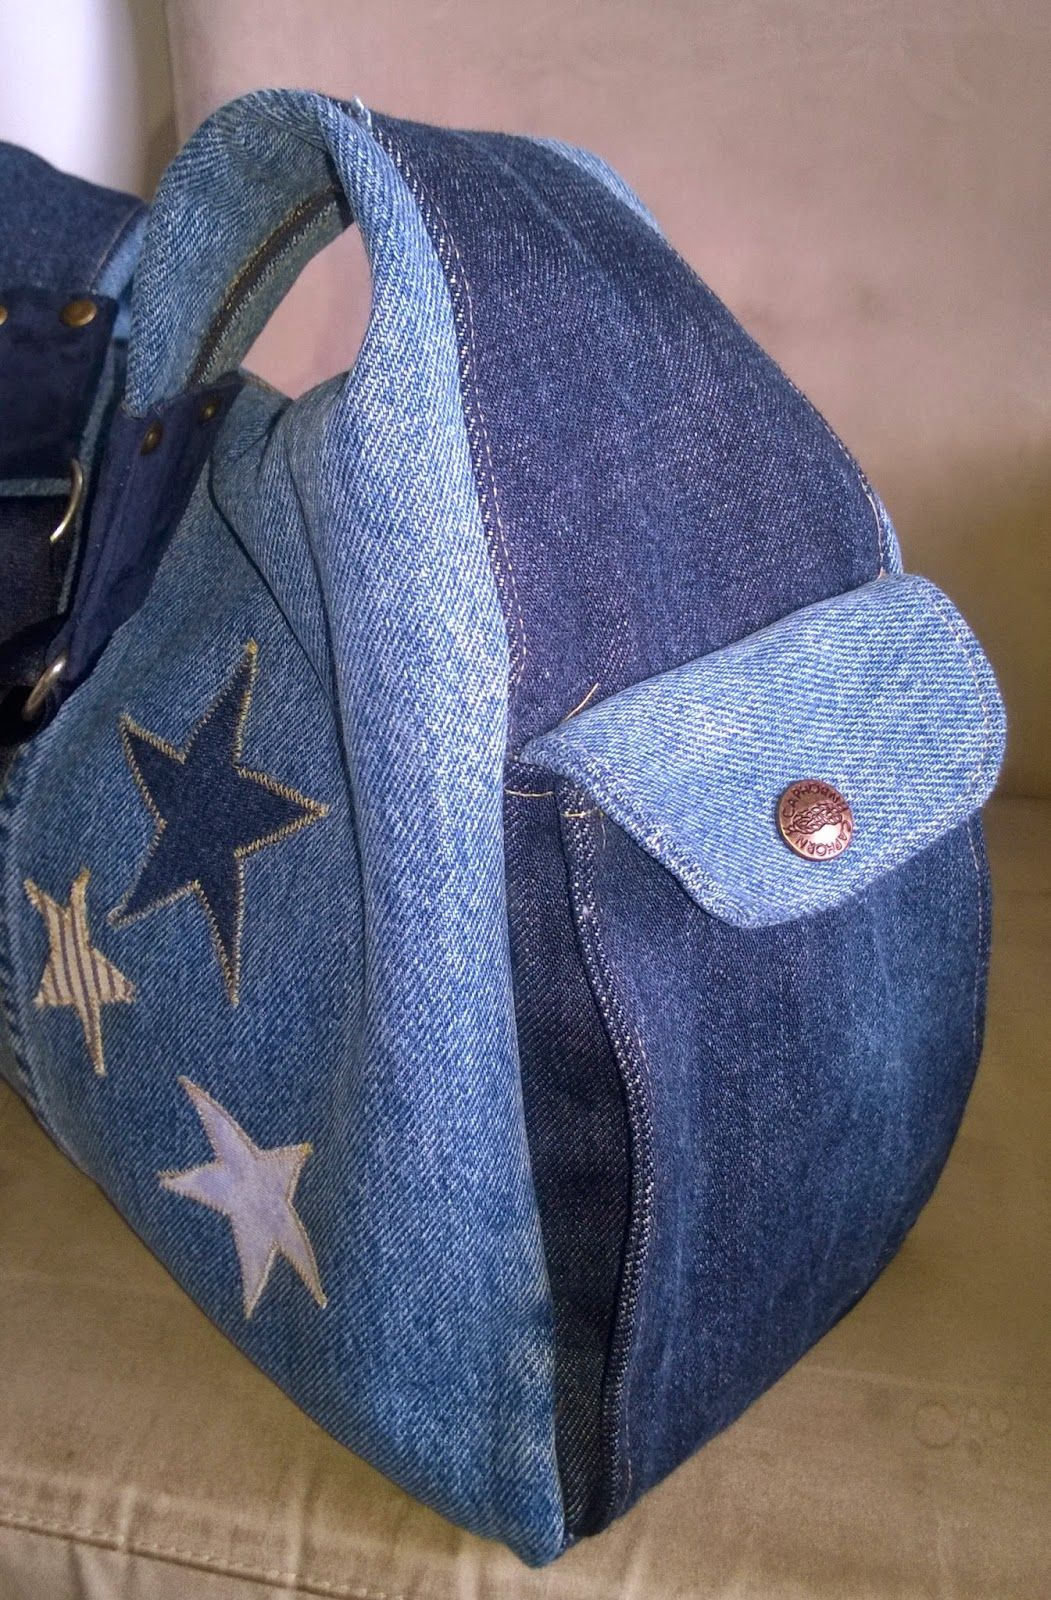 Longchamp hack - recycled denim jeans - kierrätysfarkut